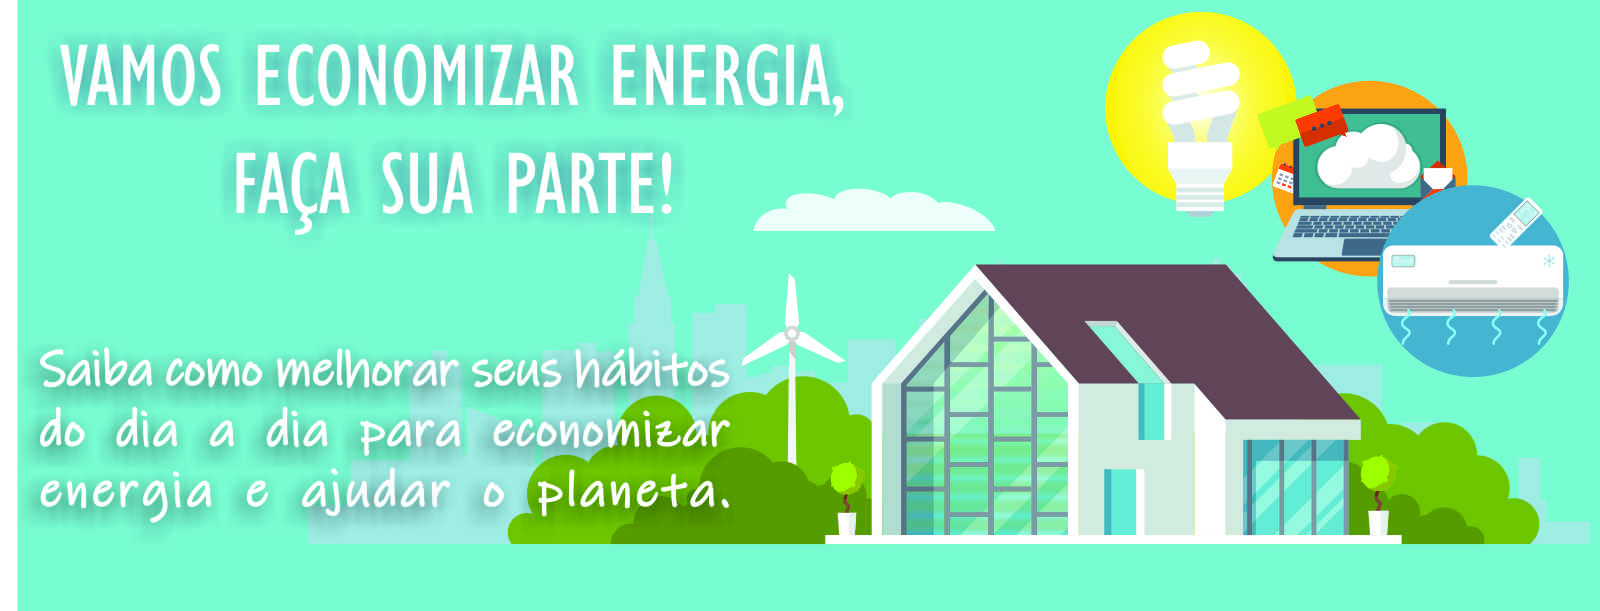 Vamos Economizar Energia